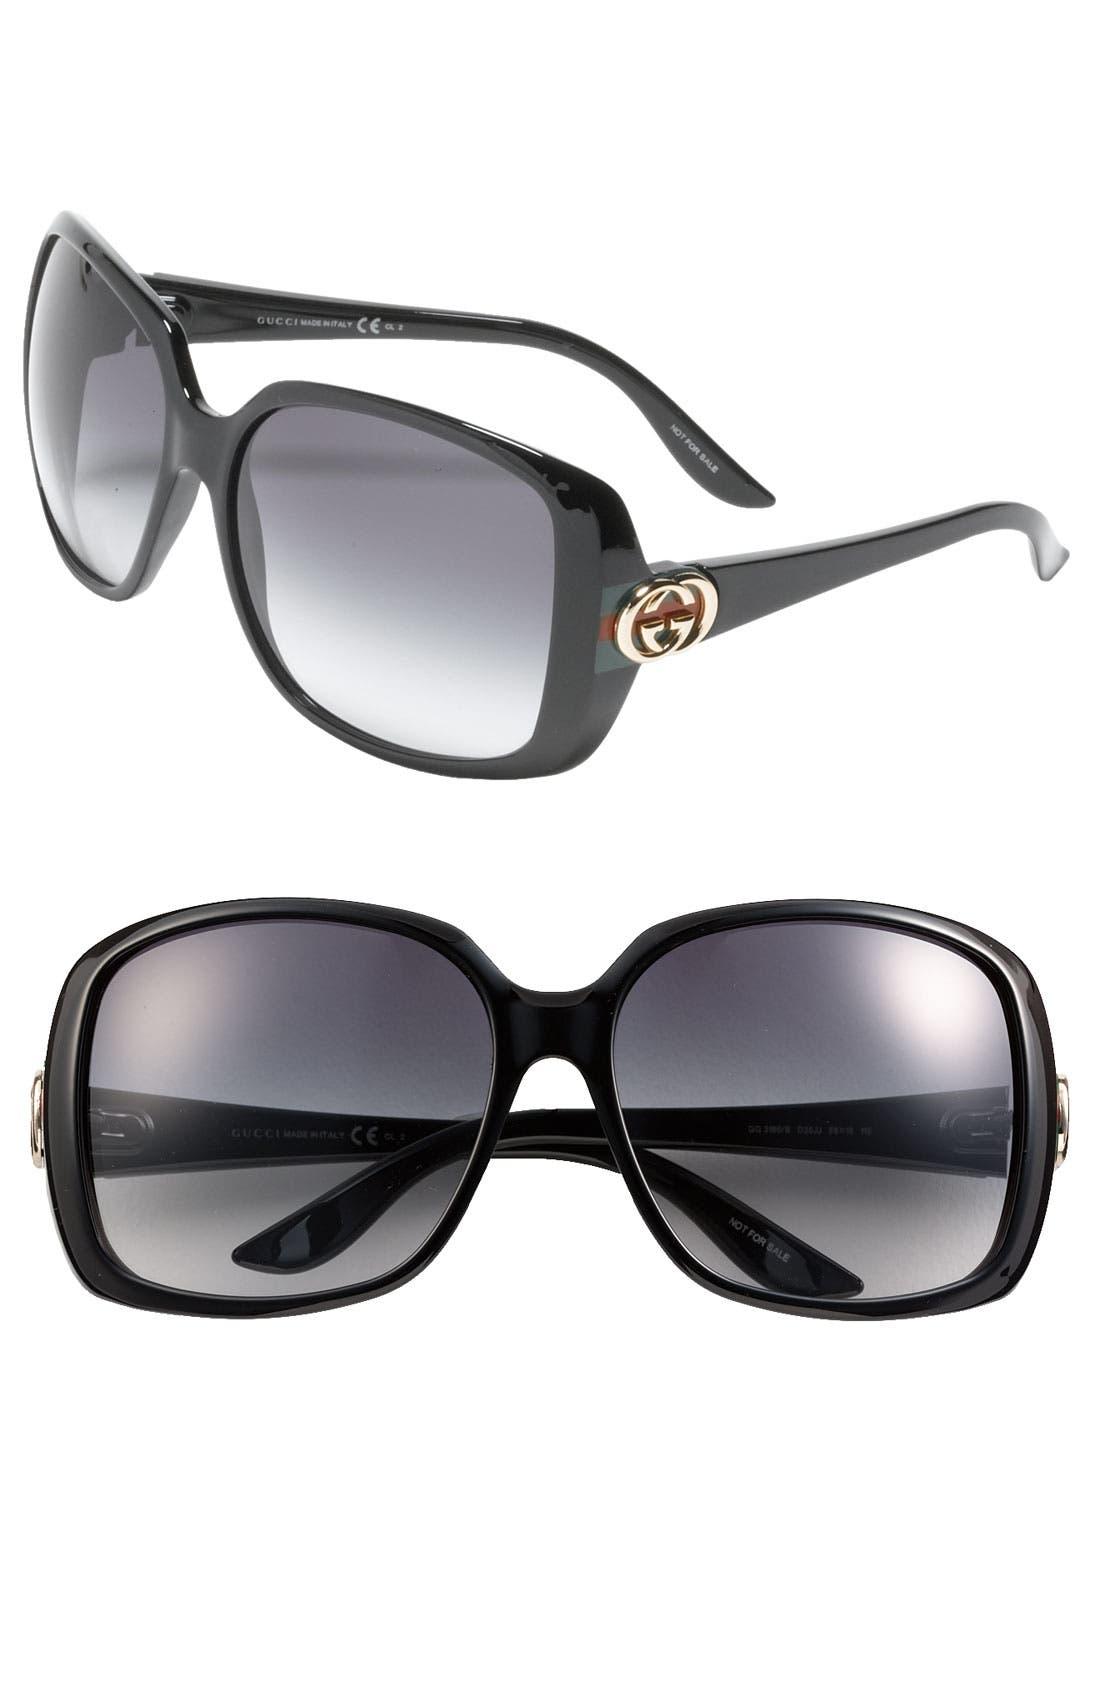 Main Image - Gucci 59mm Oversized Square Sunglasses